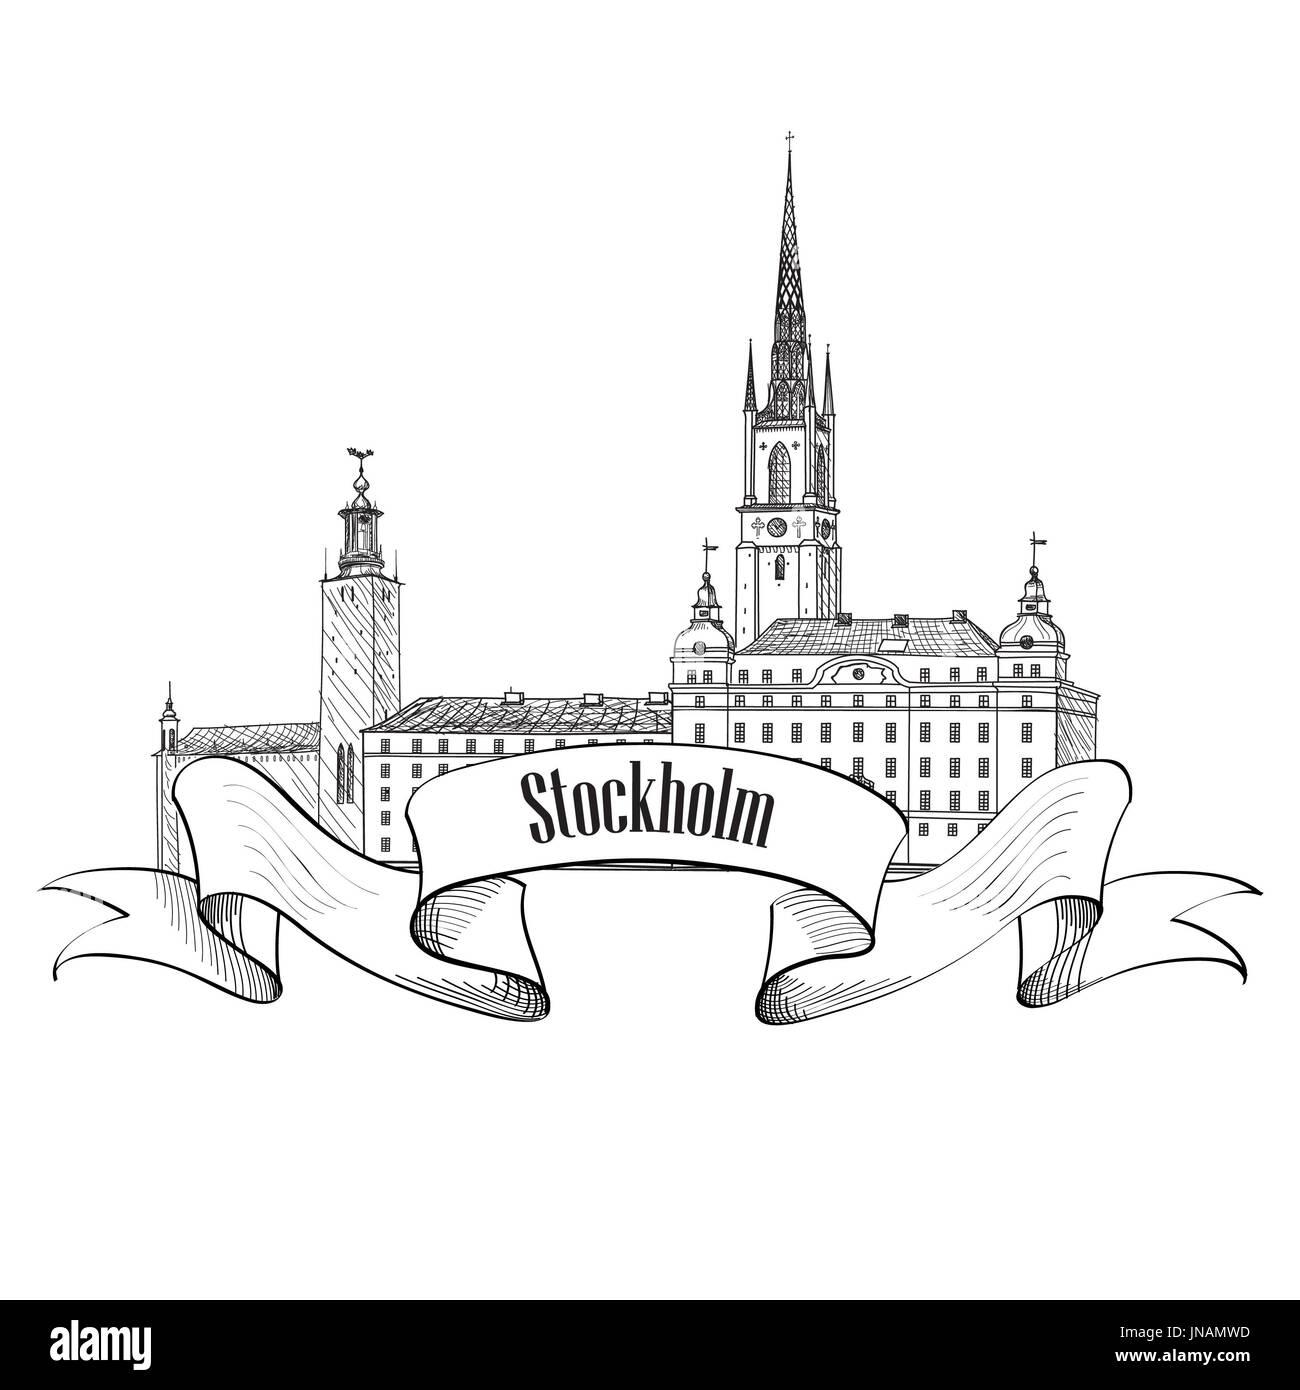 Stockholm label isolated. Travel Sweden symbol. Stockholm Old Town architecture detailed skyline. Vector landmark building illustration.FstF - Stock Image